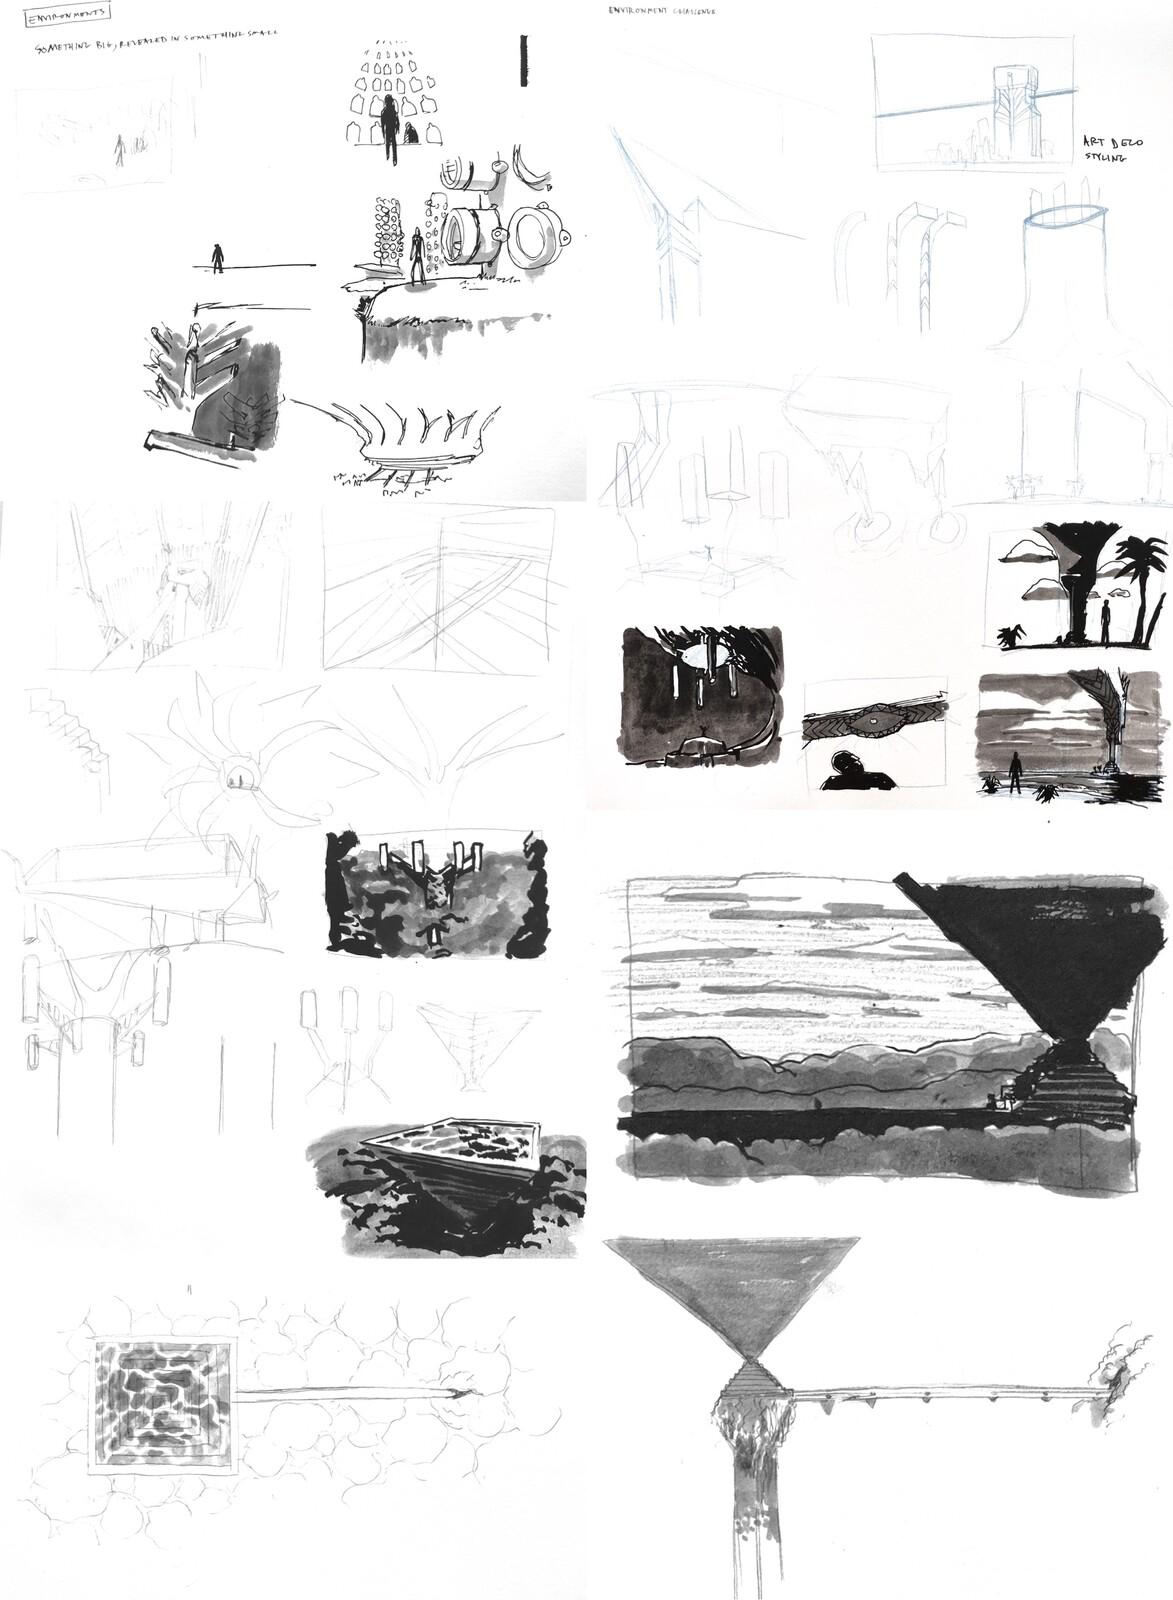 Initial brainstorming sketches